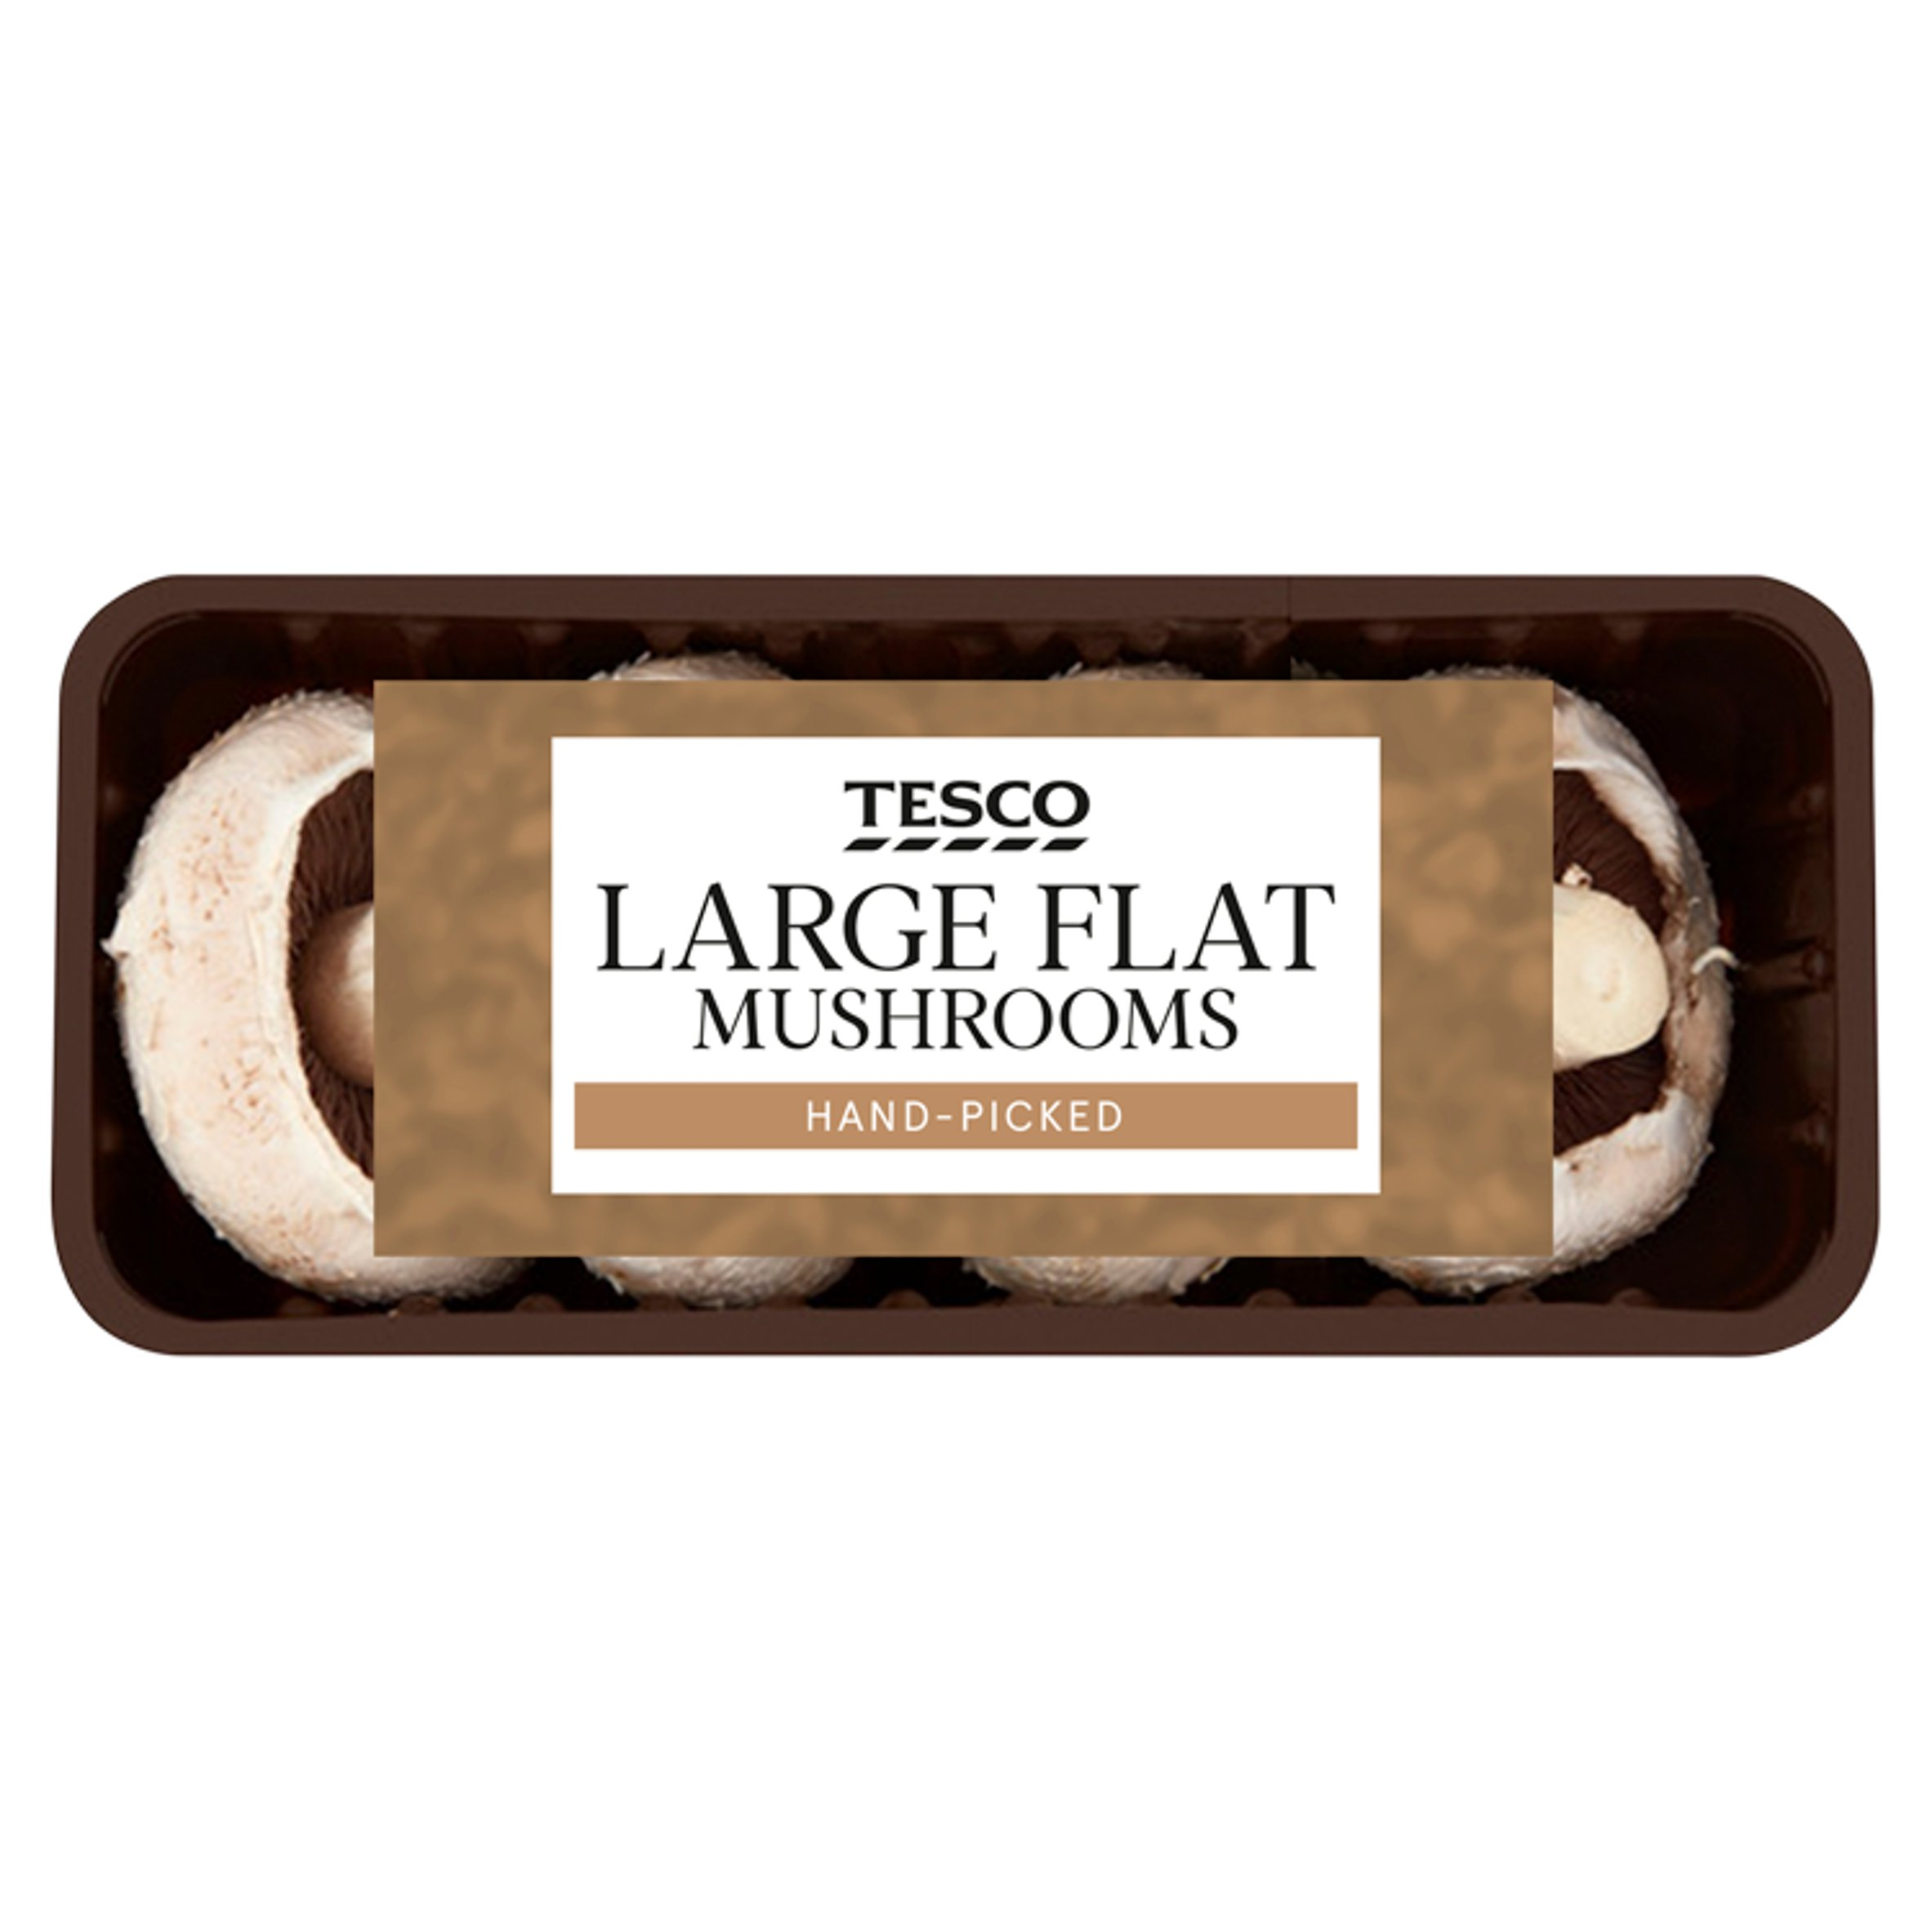 Tesco Large Flat Mushrooms 250G